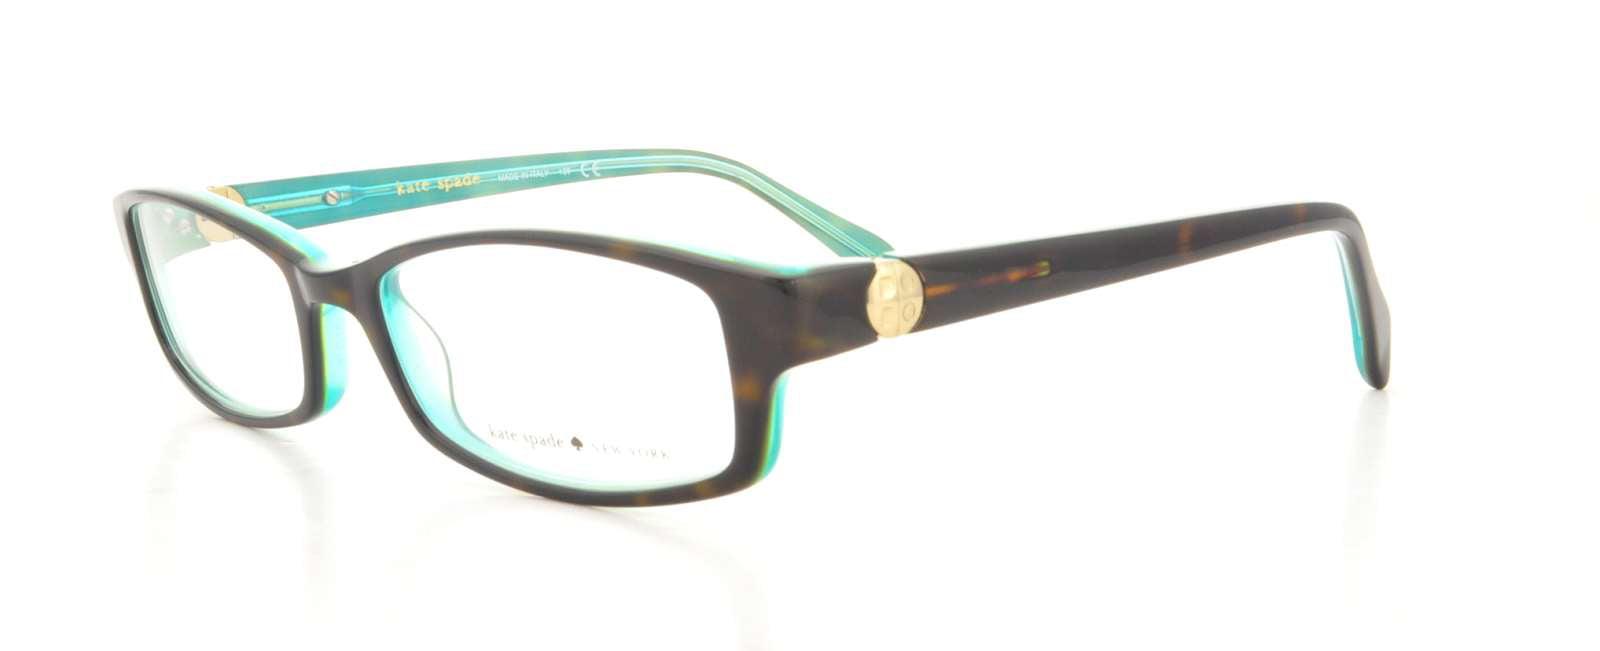 KATE SPADE Eyeglasses ELISABETH 0JEY Tortoise Aqua 49MM - Walmart.com